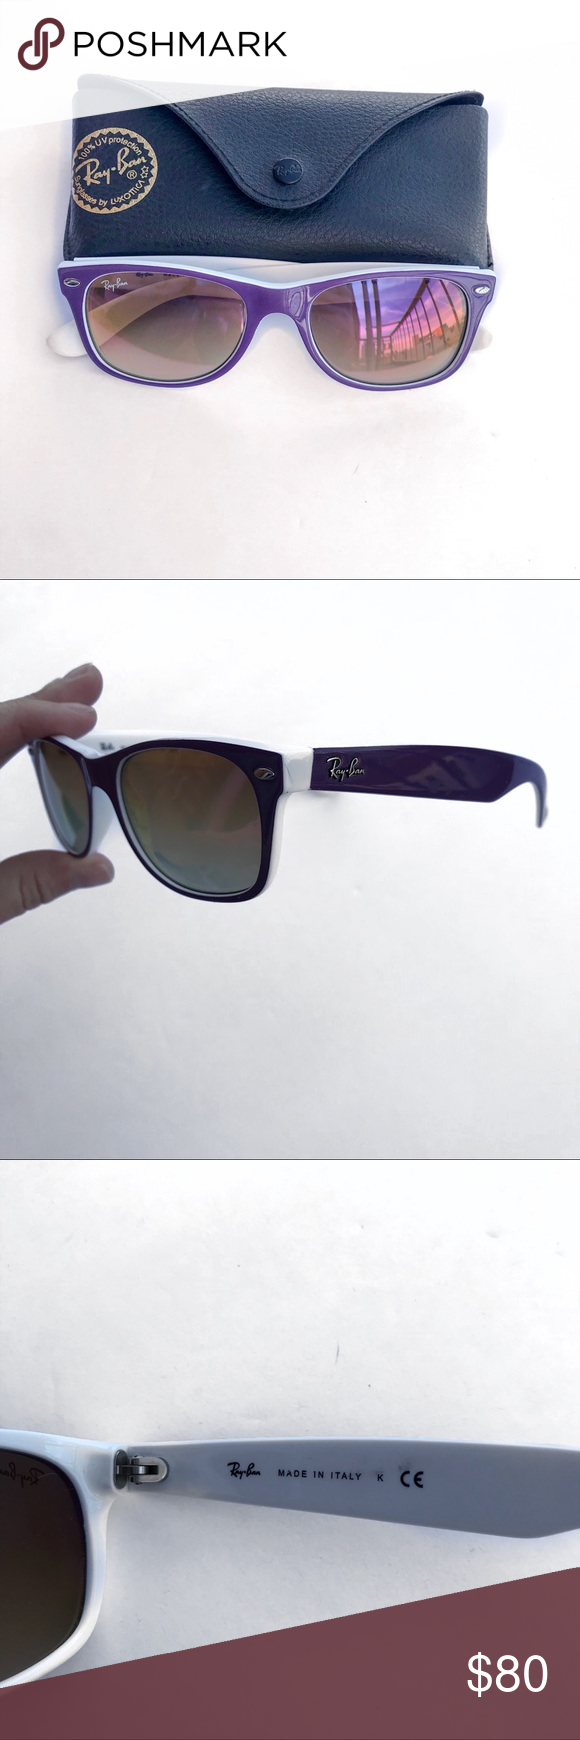 Ray Ban Wayfarer 52 Rayban Wayfarer Sunglasses Accessories Sunglasses Case